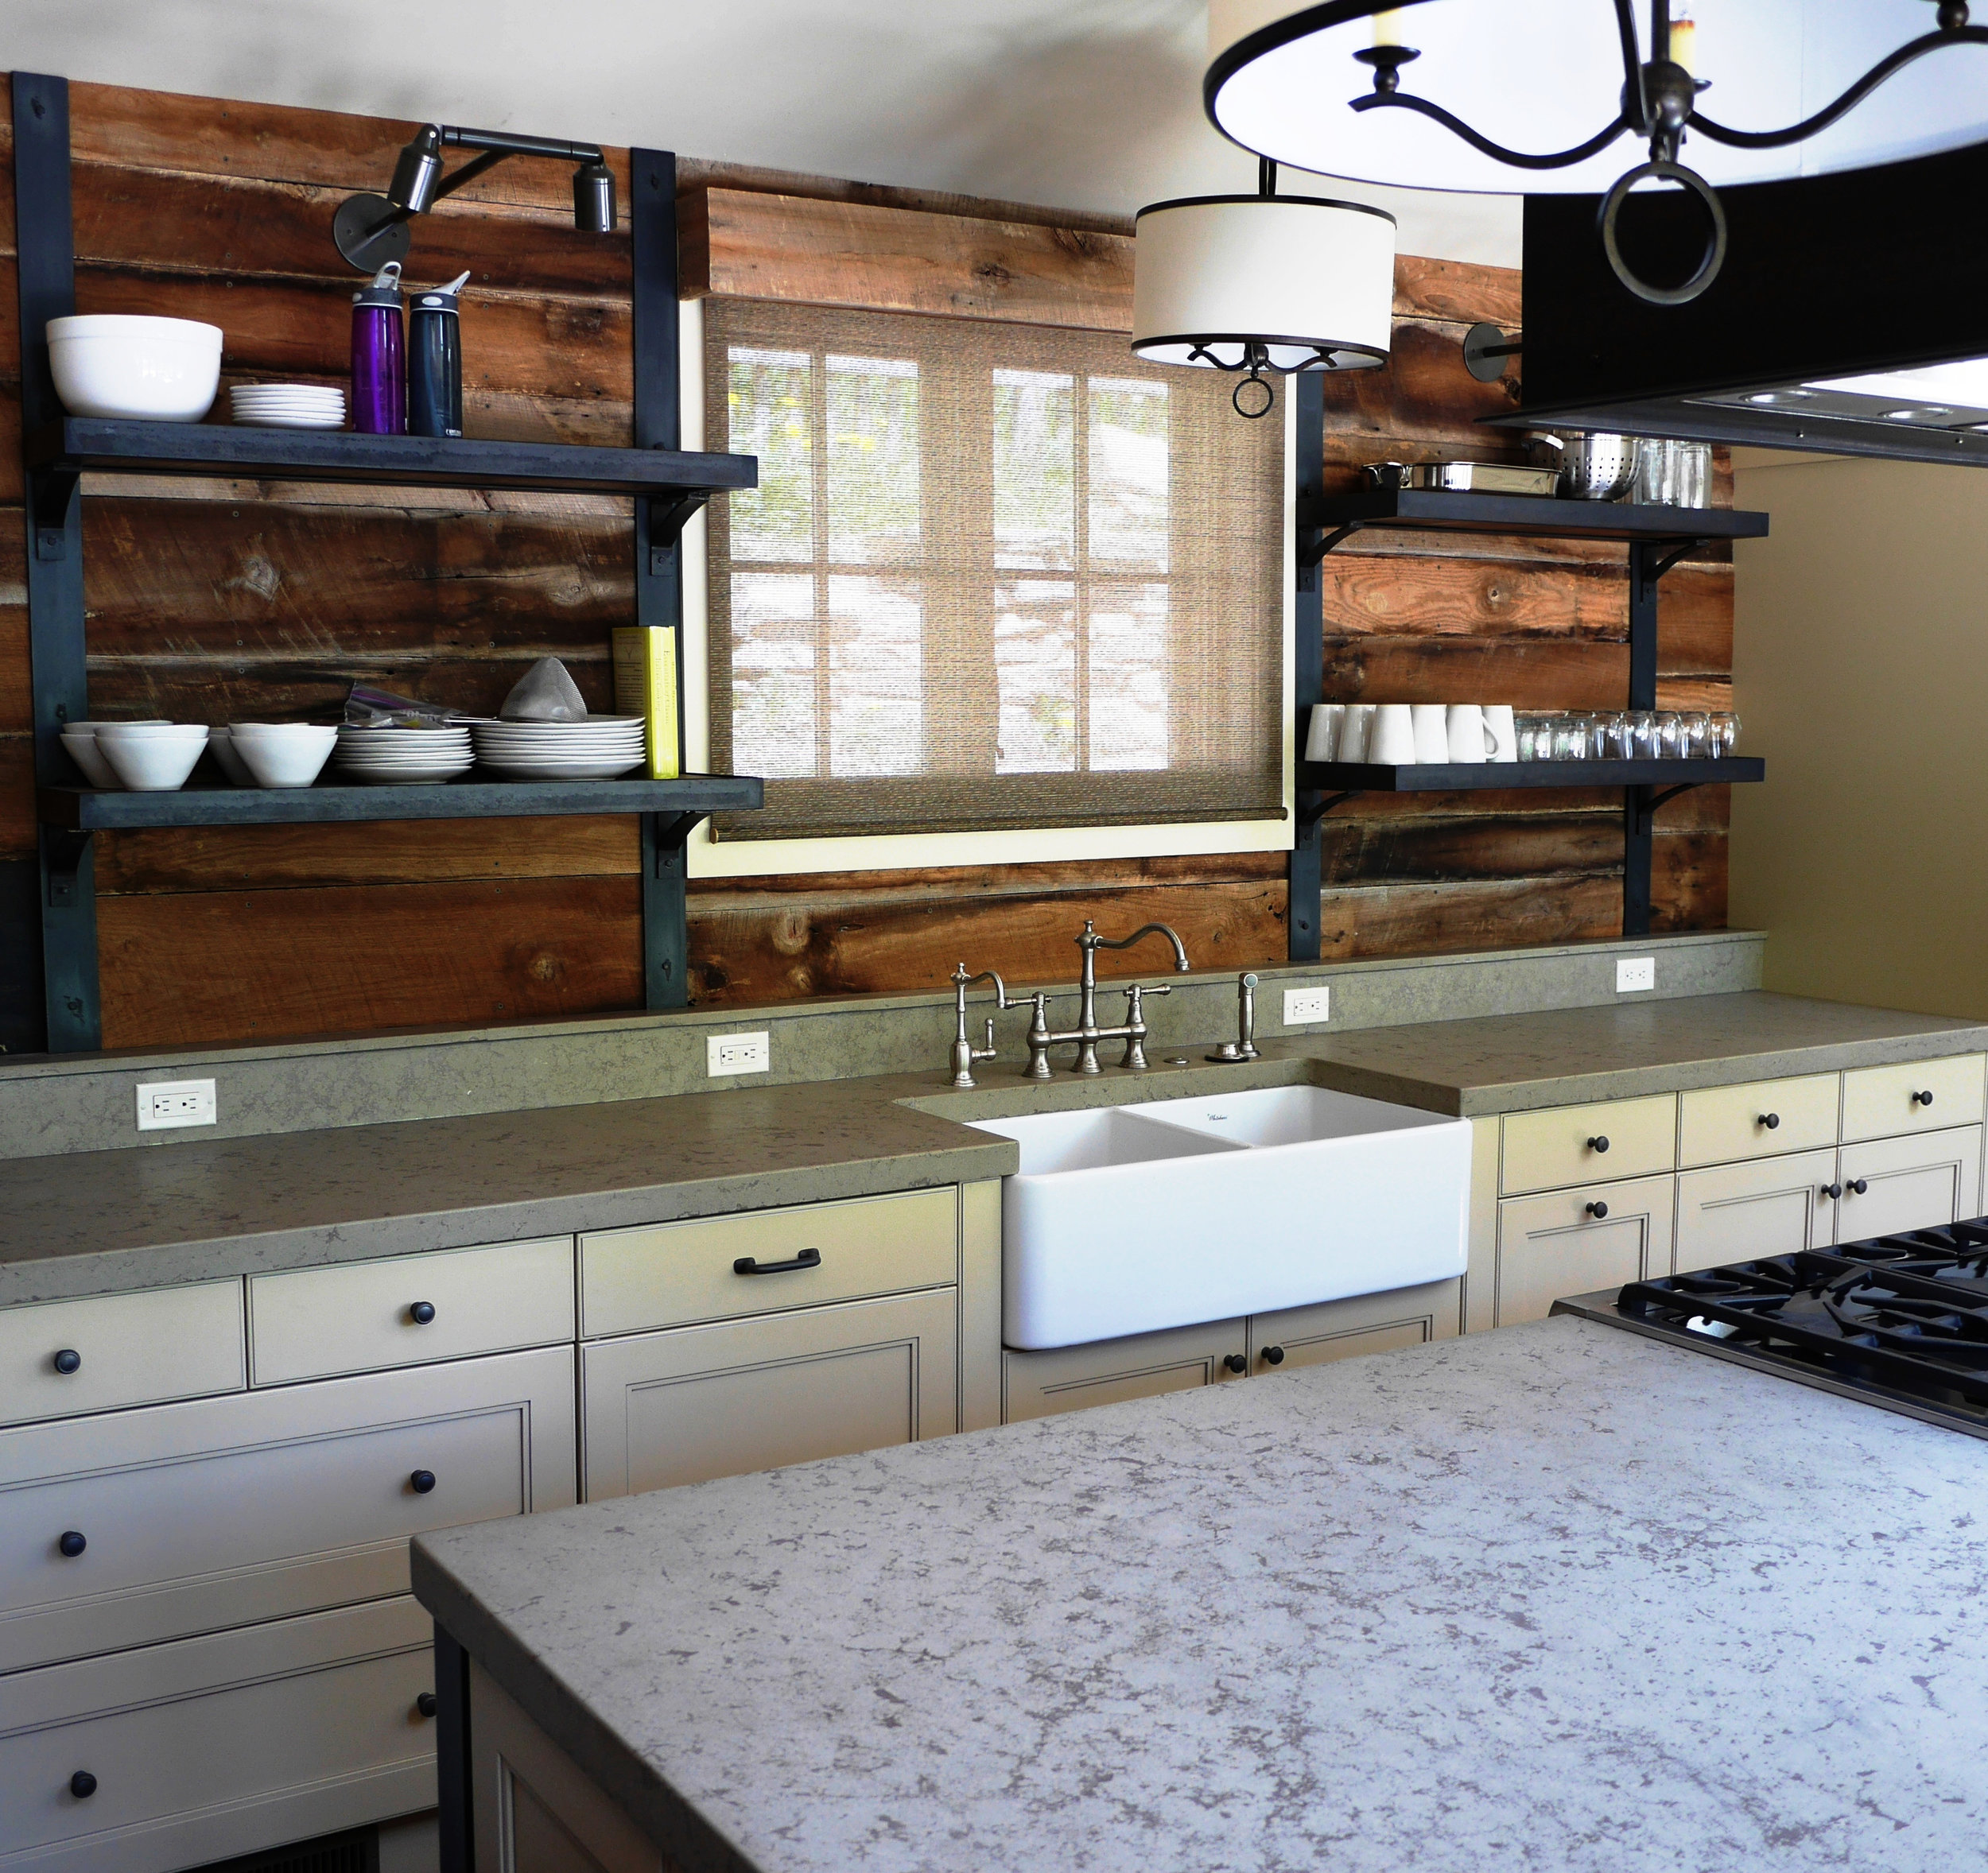 Copy of Handpressed Concrete Kitchen Countertops.jpg